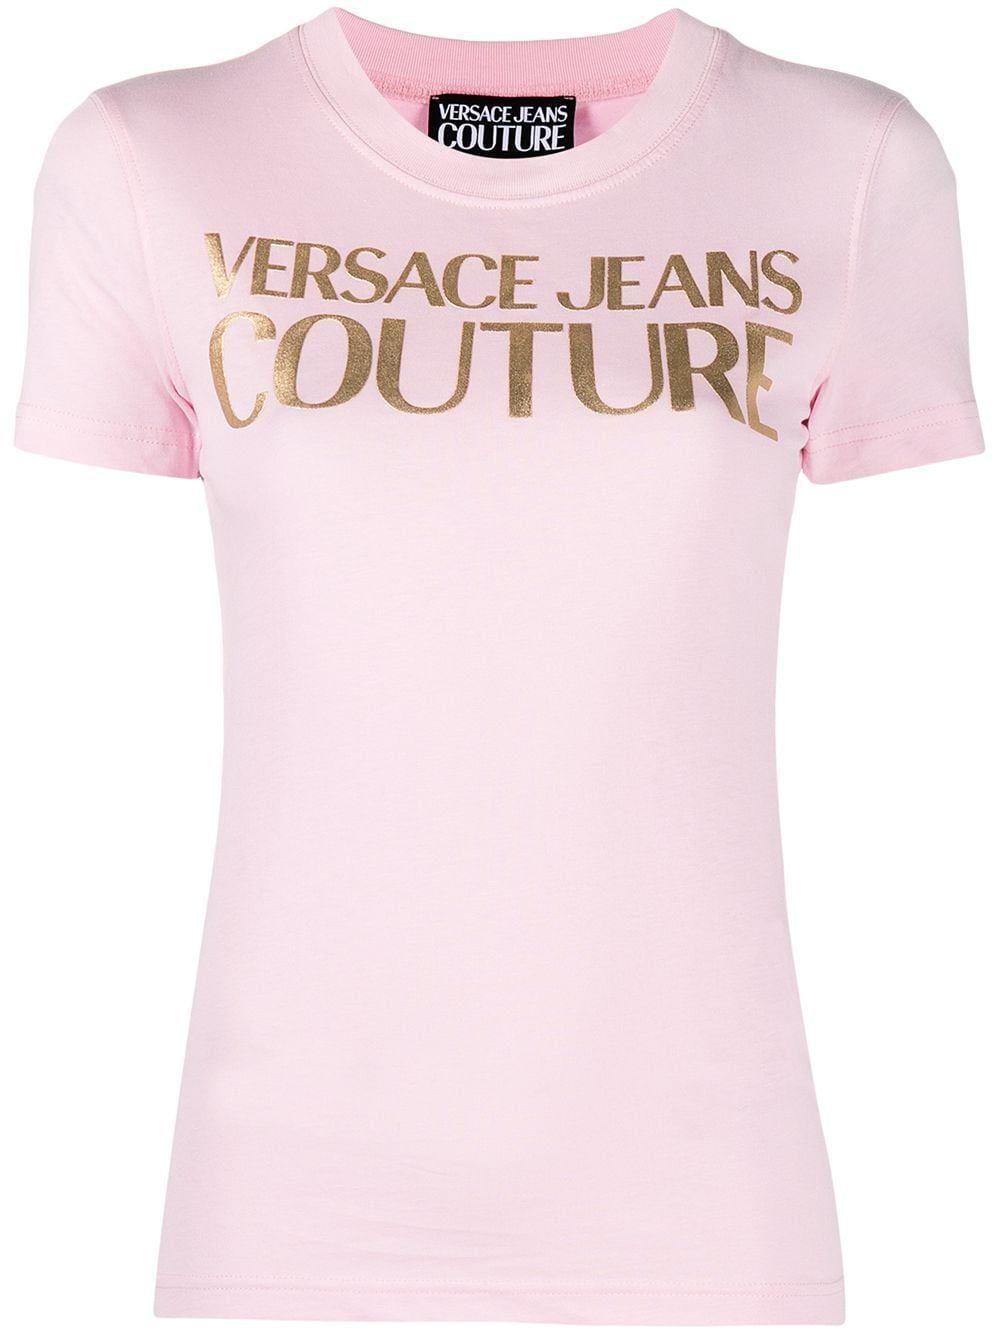 Versace Jeans VERSACE JEANS WOMEN'S PINK COTTON T-SHIRT